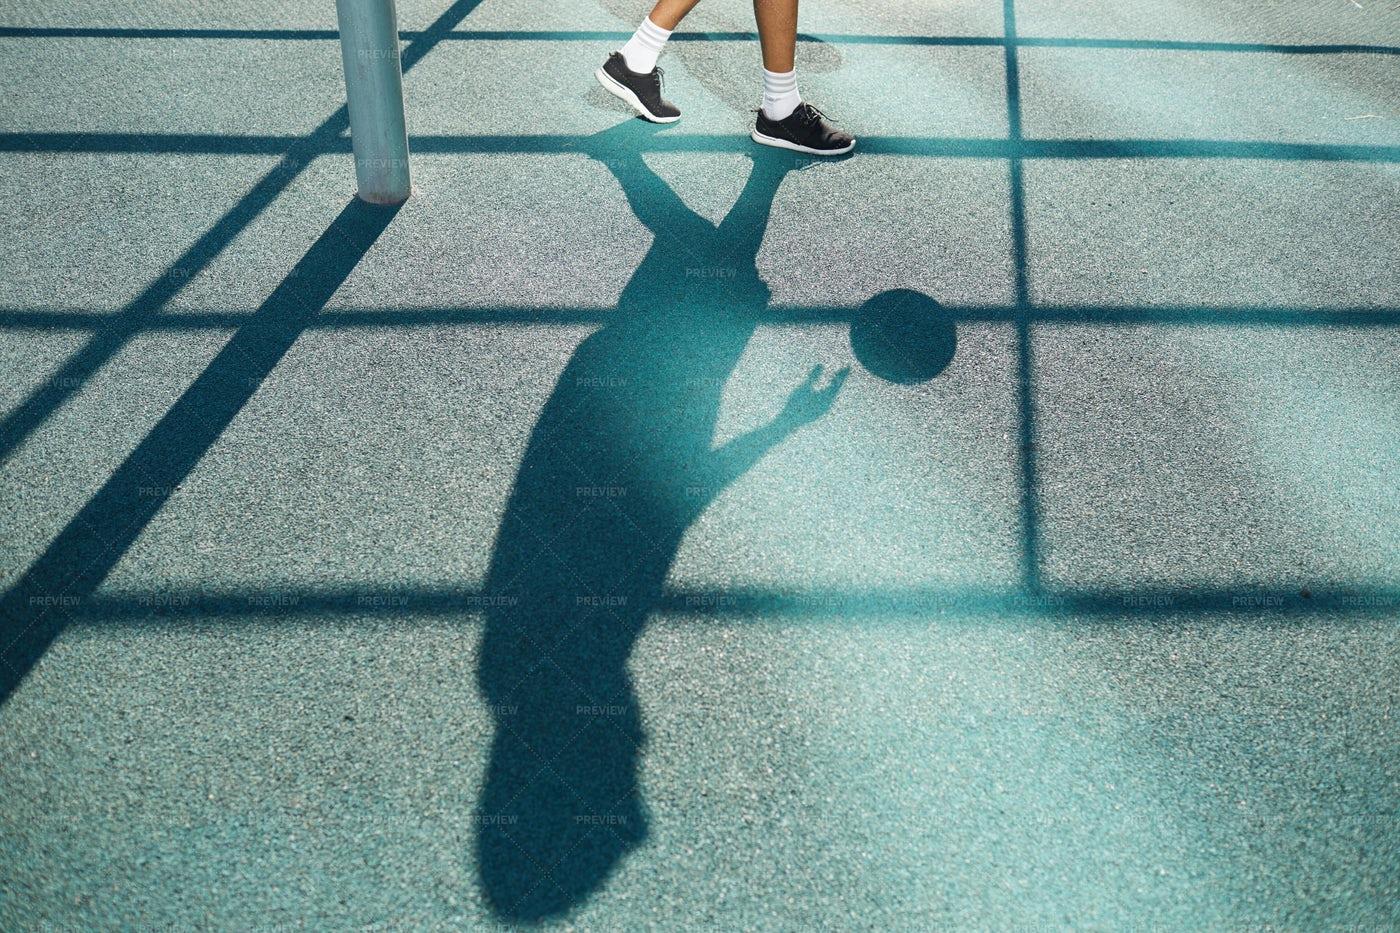 Shadow Of Basketball Player: Stock Photos